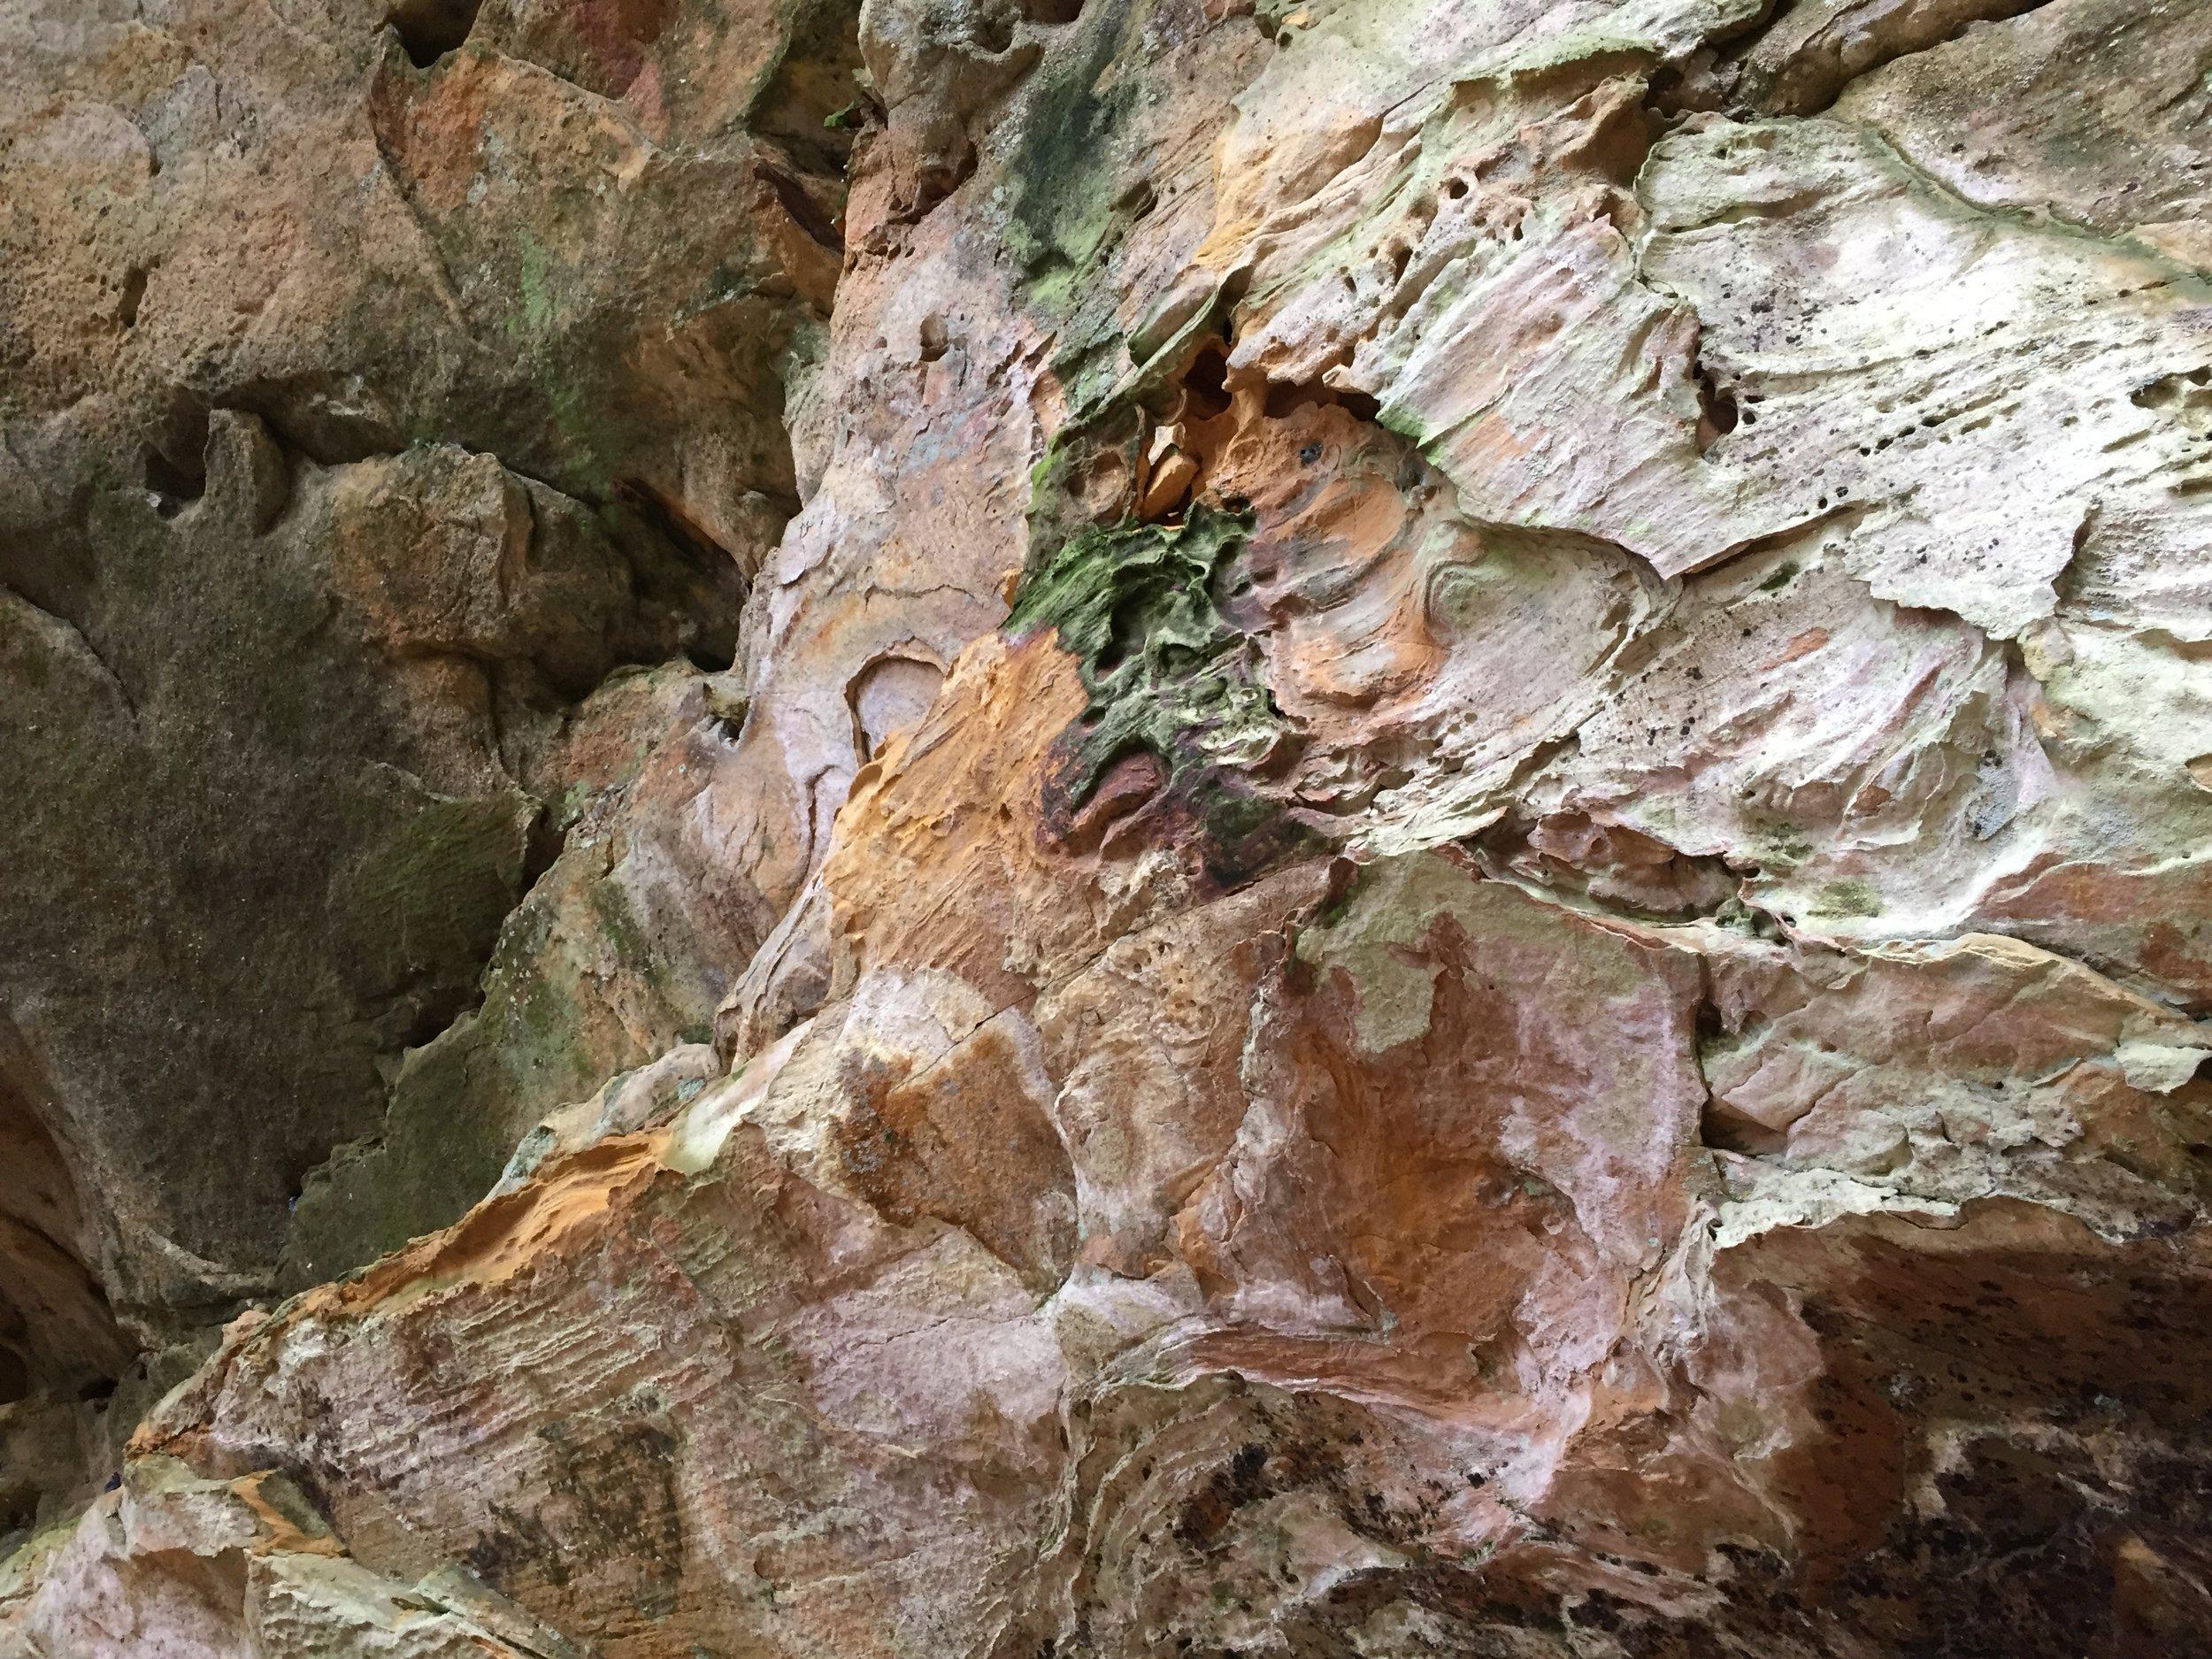 Cave colors